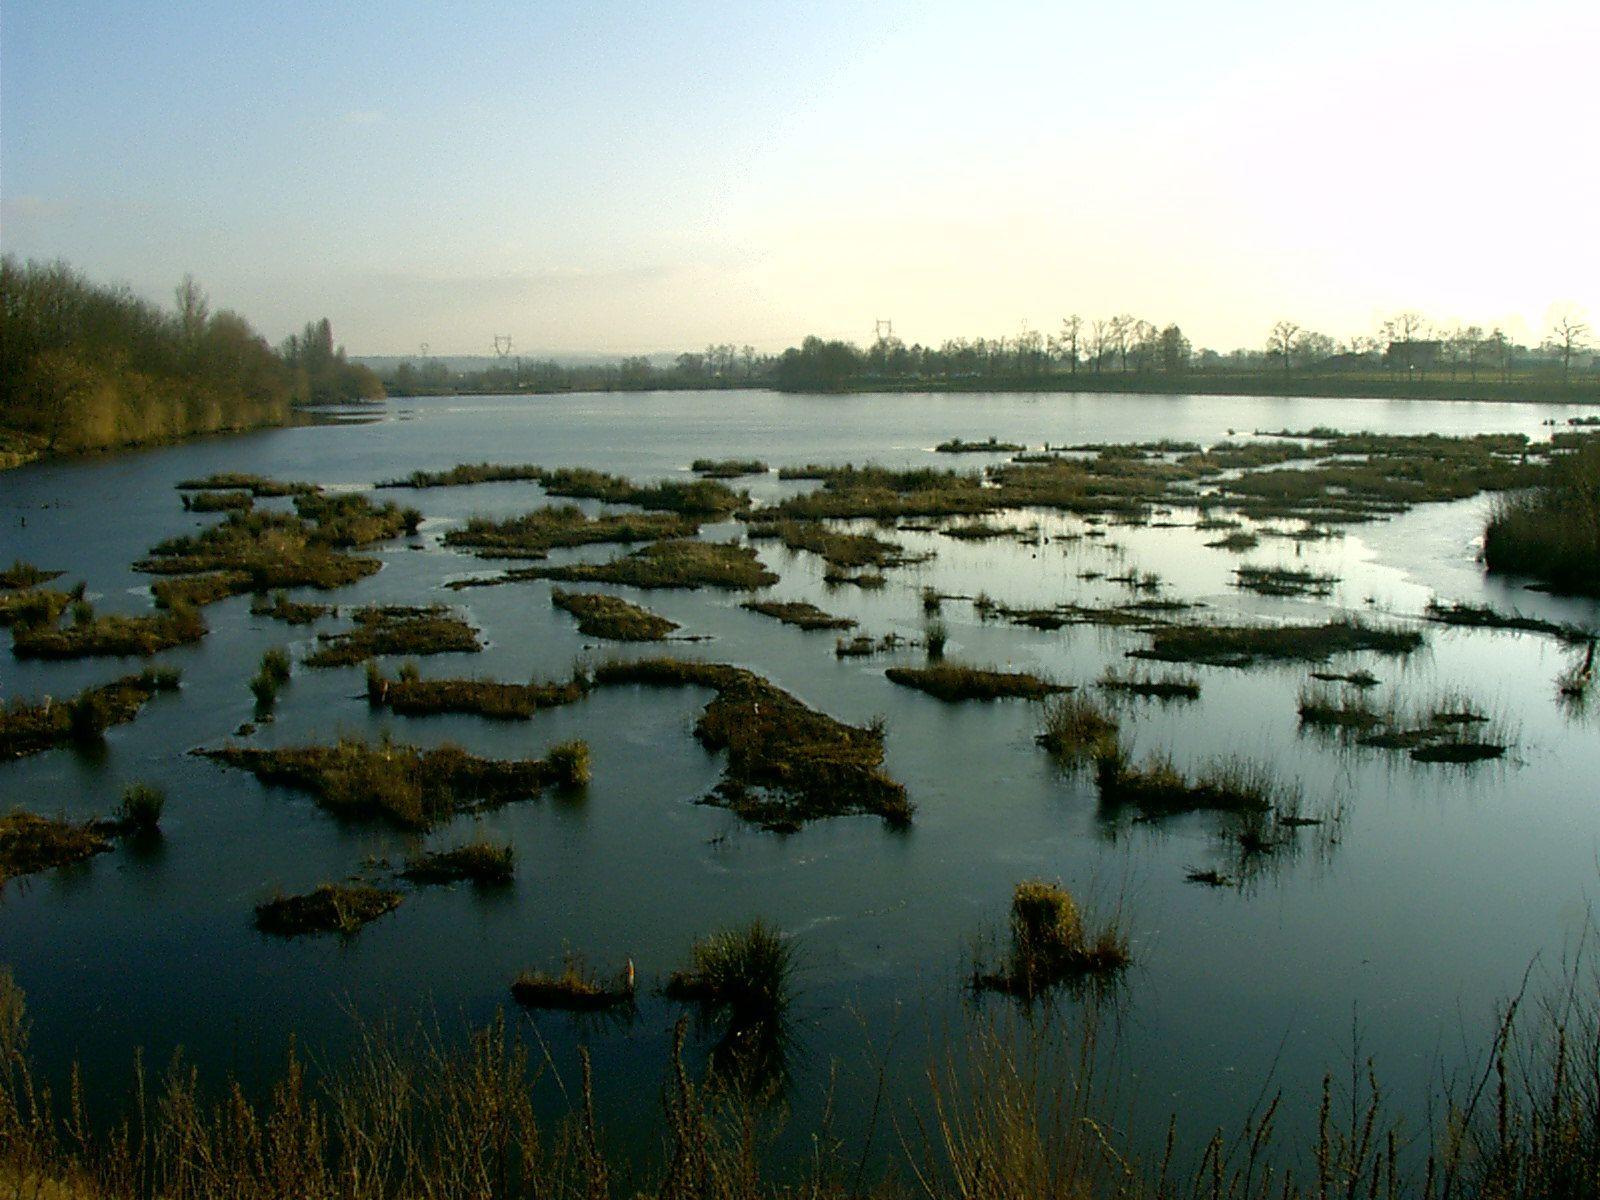 étang de cornillon - Rhone-Alpes - (42) Td85x0vx